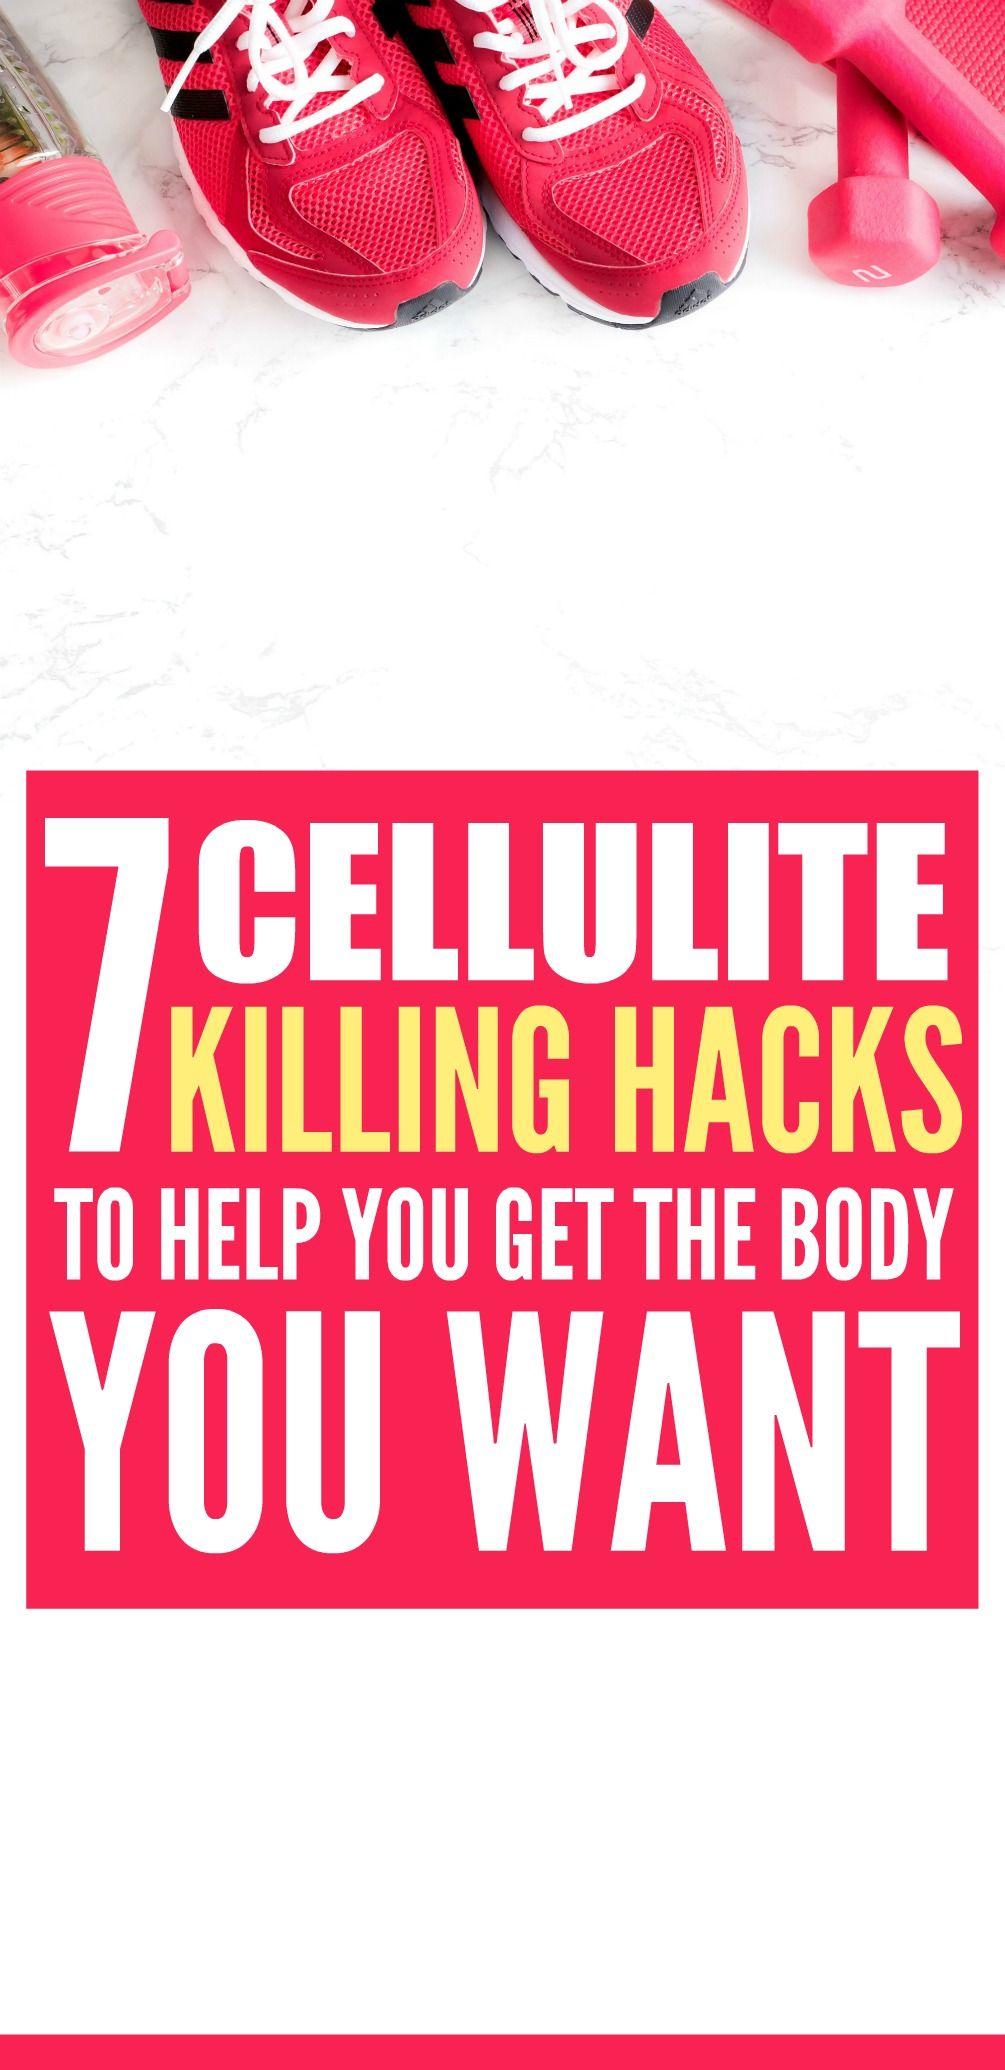 Best ways to lose belly fat in a week